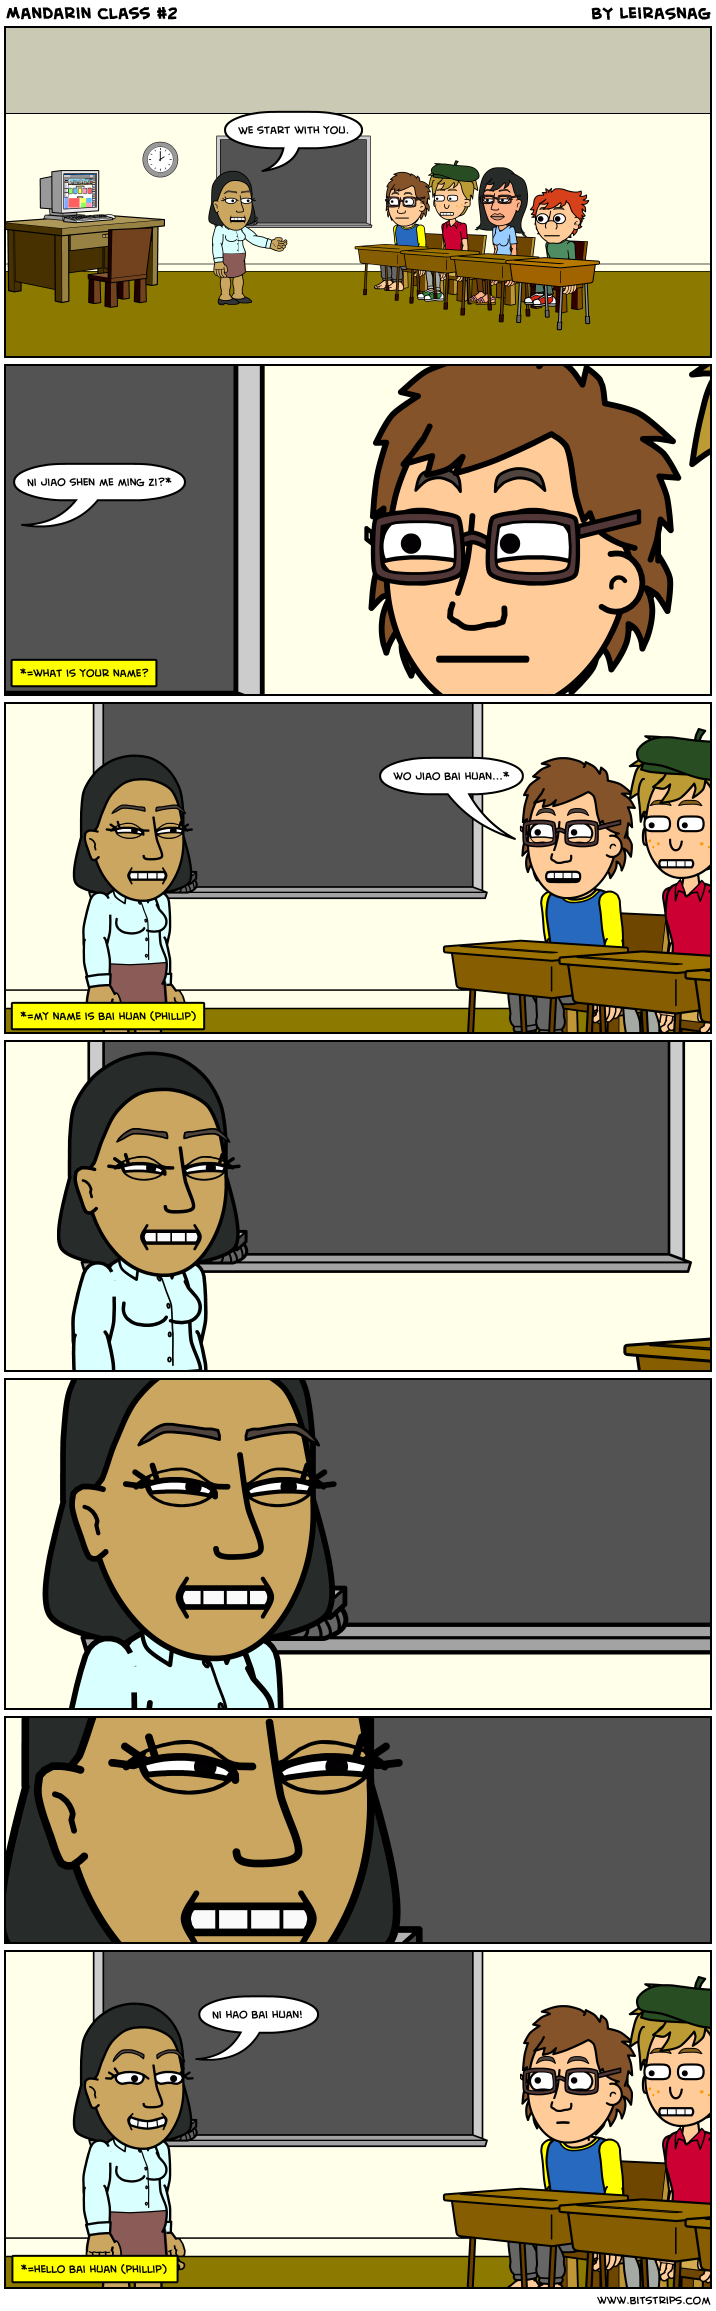 Mandarin class #2